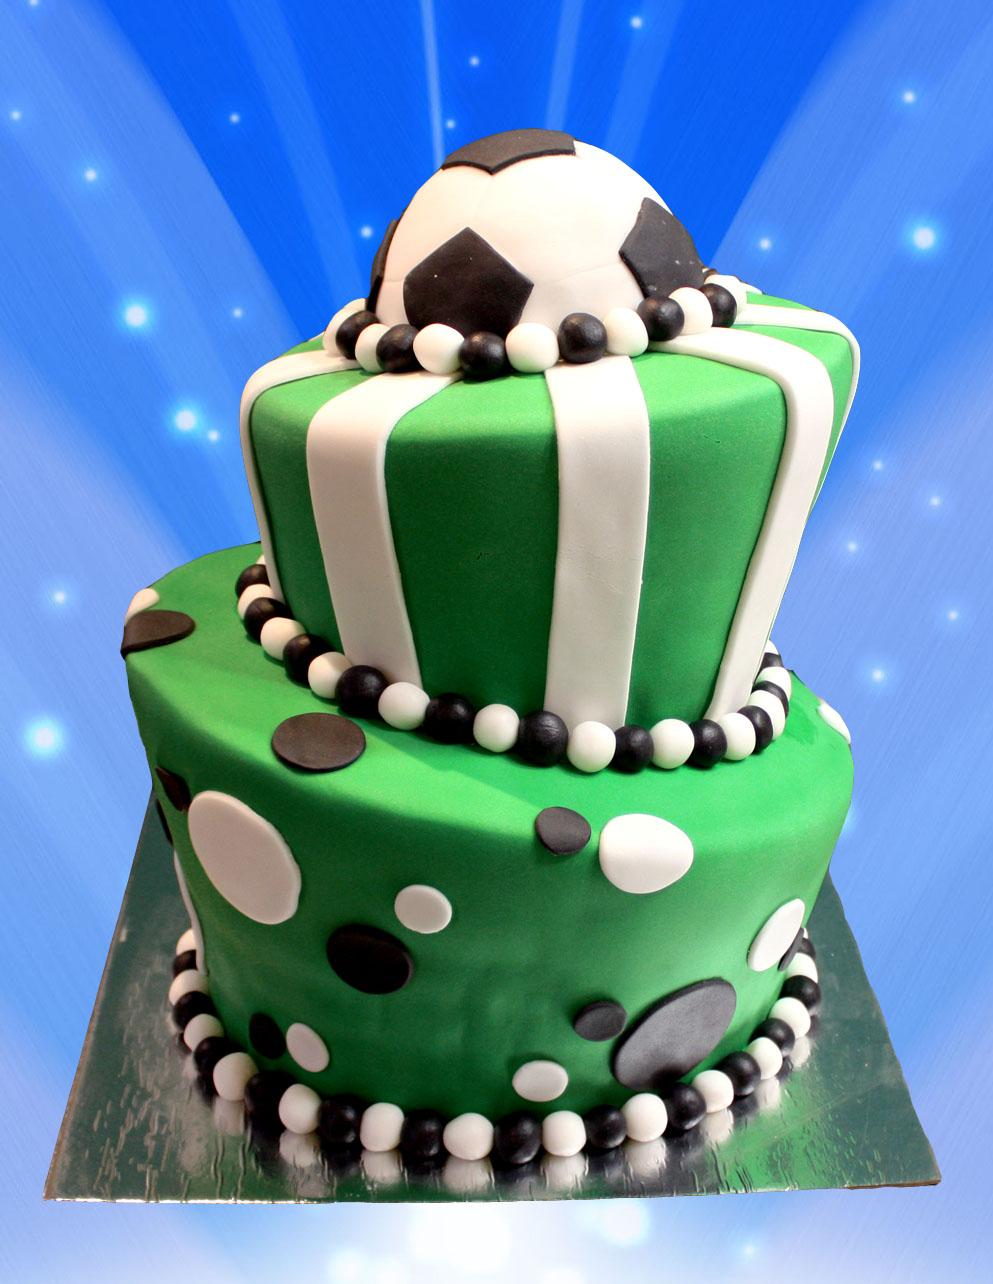 Images Of Soccer Cake : football cake Flickr - Photo Sharing!